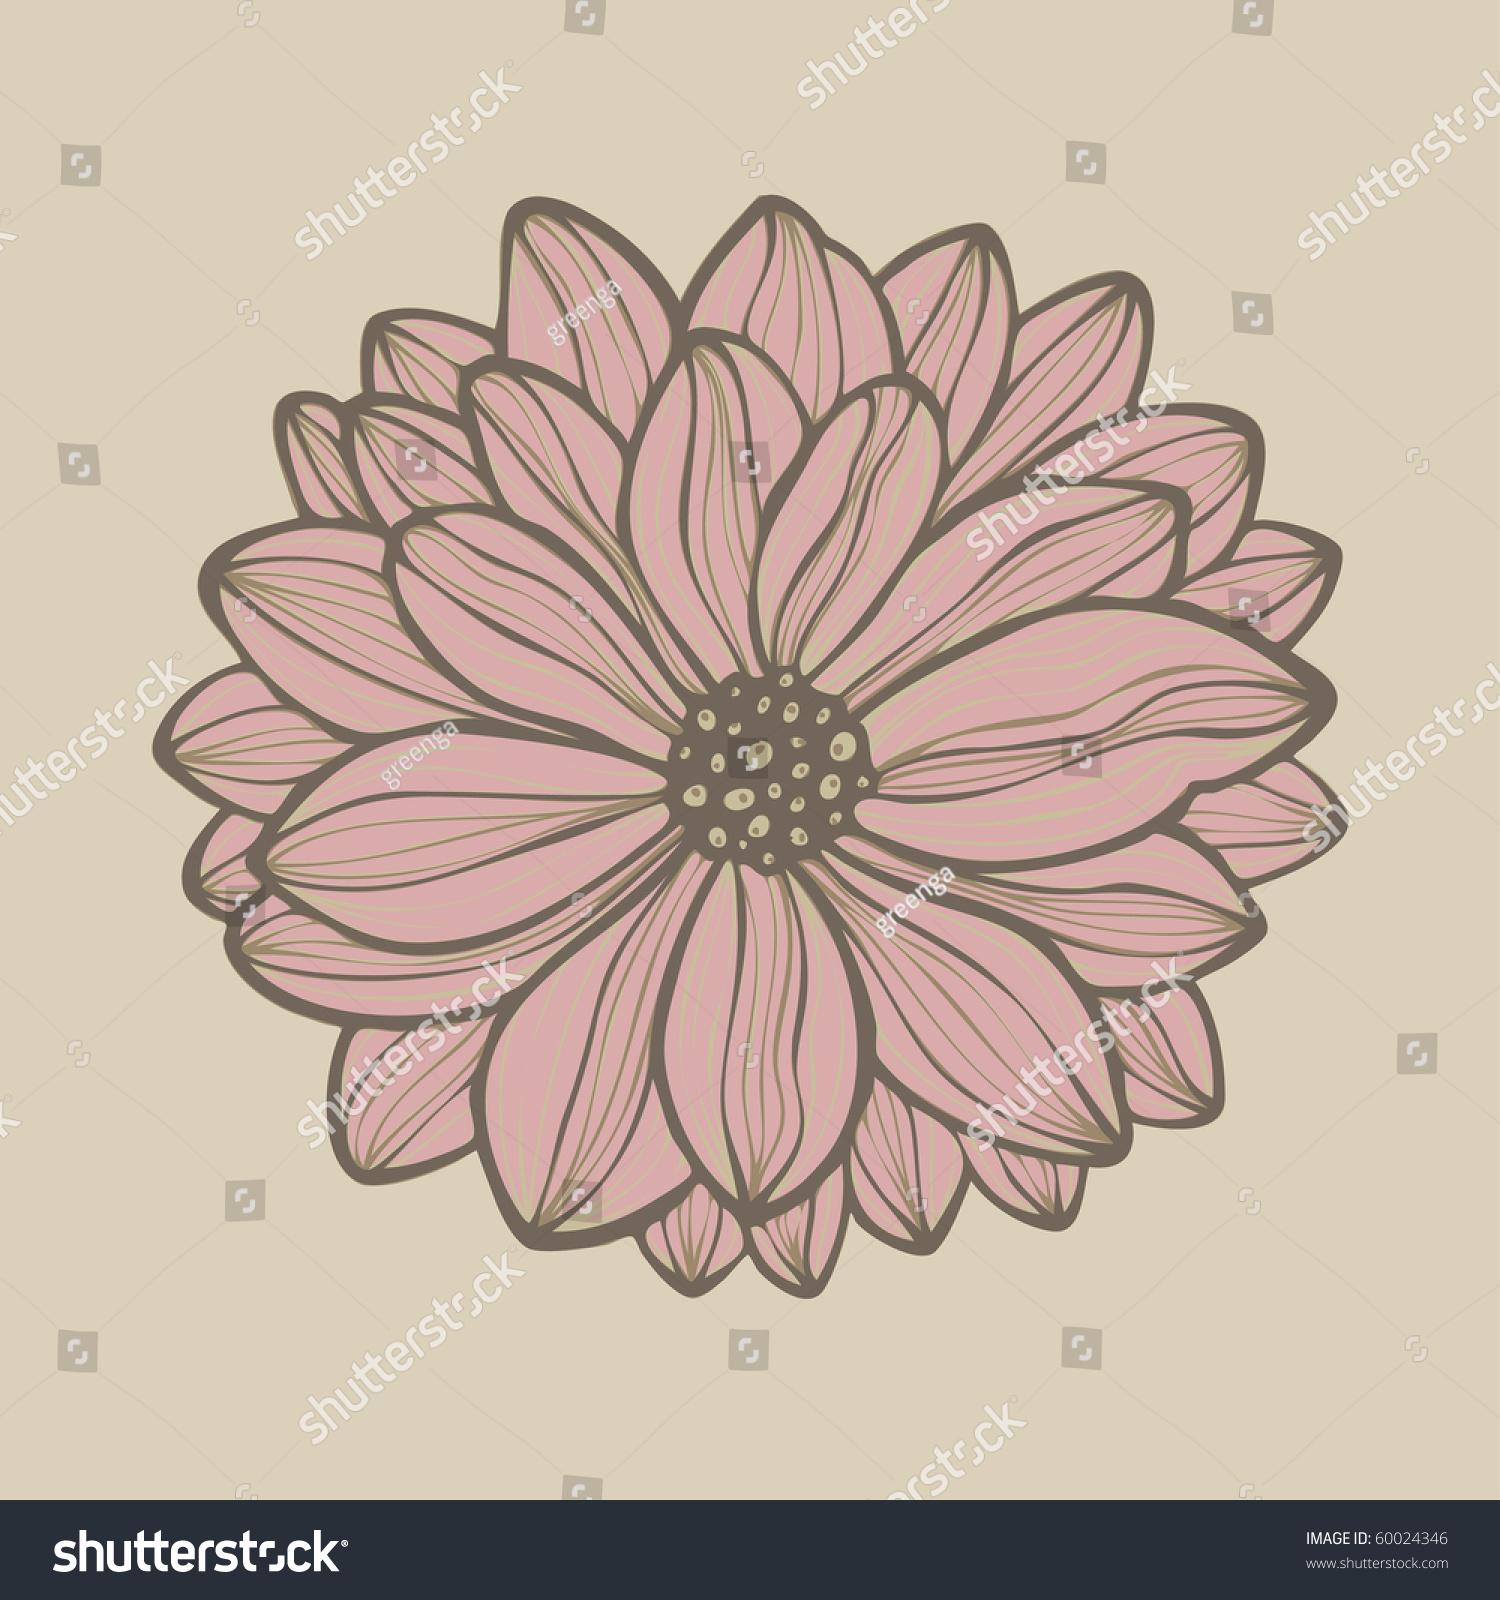 Hand Drawn Flower, Vector - 60024346 : Shutterstock